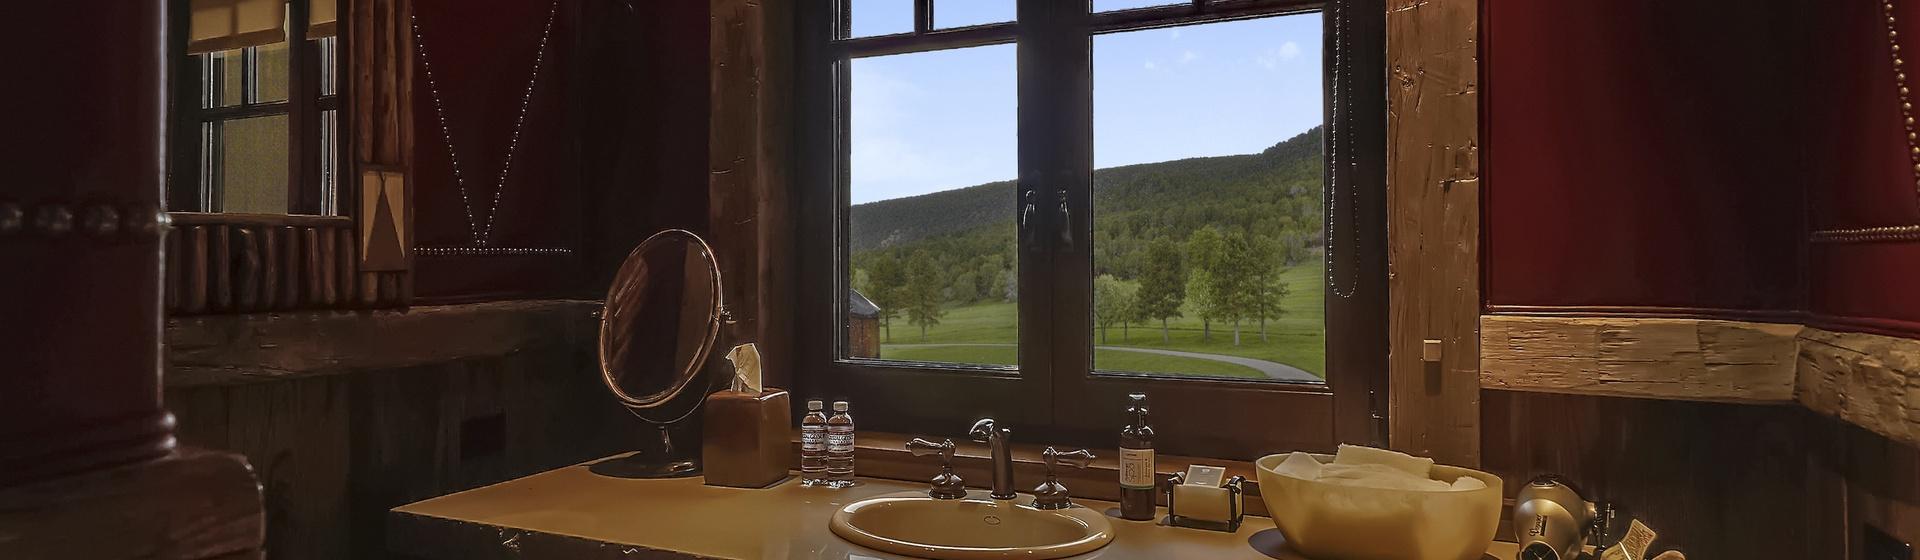 7.2-Telluride-Sleeping-Indian-Ranch-master-bathroom-C-web.JPG